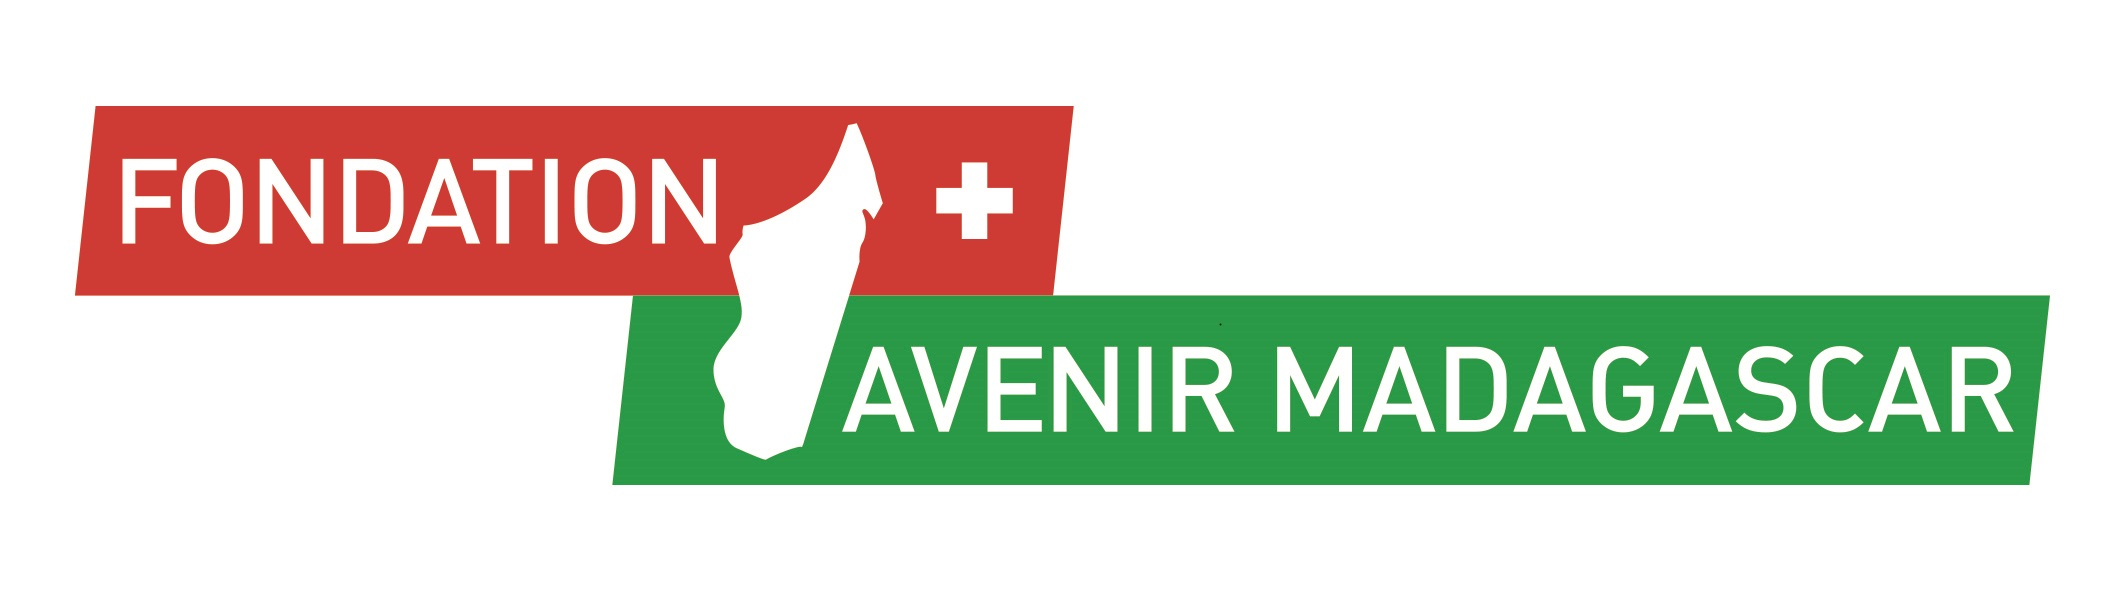 Fondation Avenir Madagascar